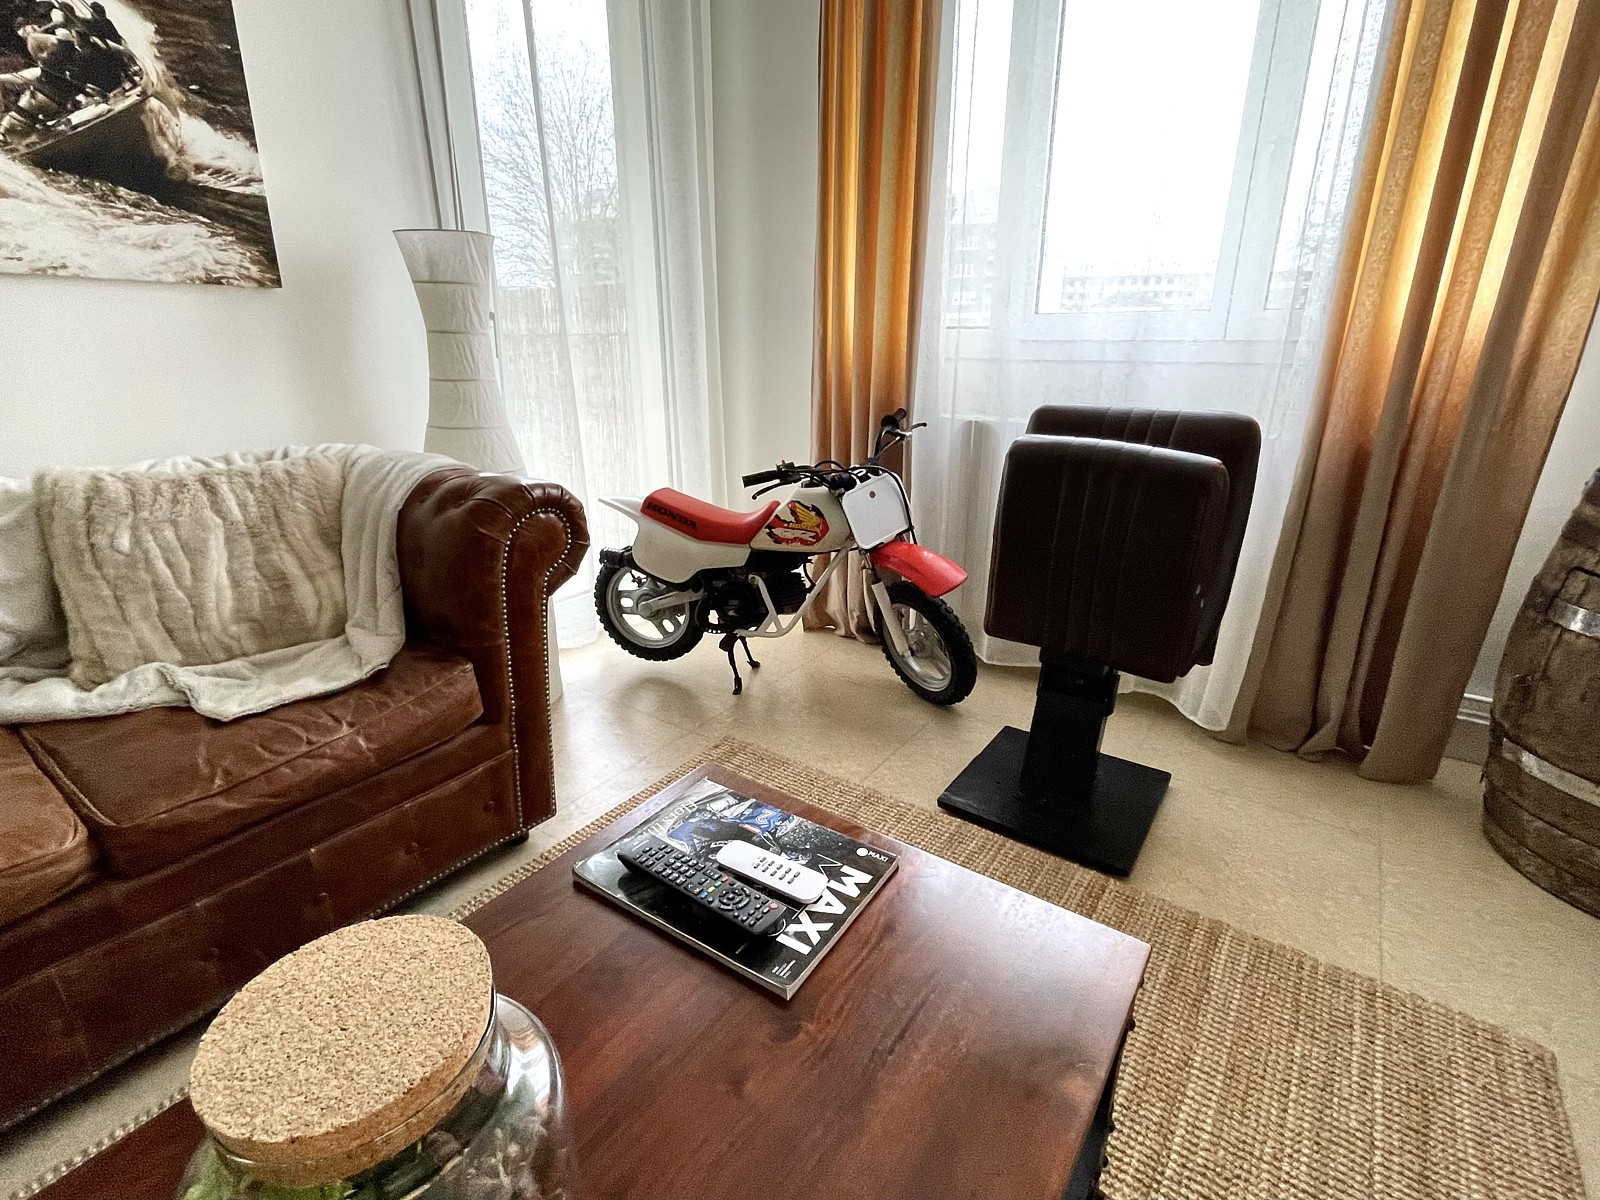 ED3BA521-0223-4B58-AA46-2F2632C0F98D - Godcho - Motocross Pictures - Vital MX